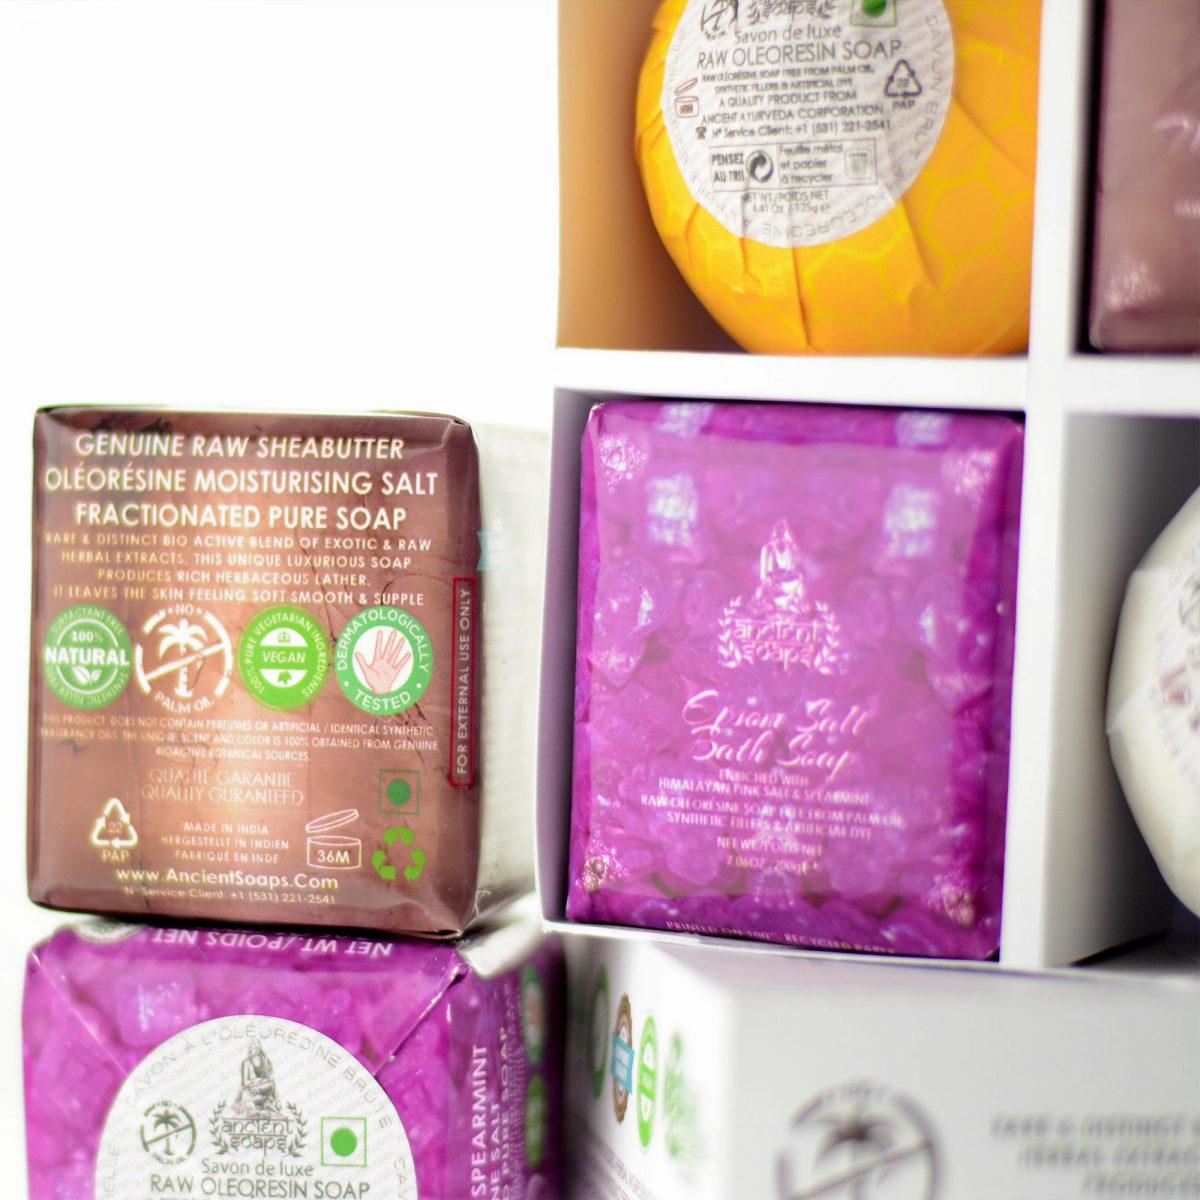 goats milk soap sugar scrub exfoliator espom epsom salt bath black coconut exfoliant honey for women men pinetar glycerin vegan bathing bar exfoliating sheabutter castile organic men unscented